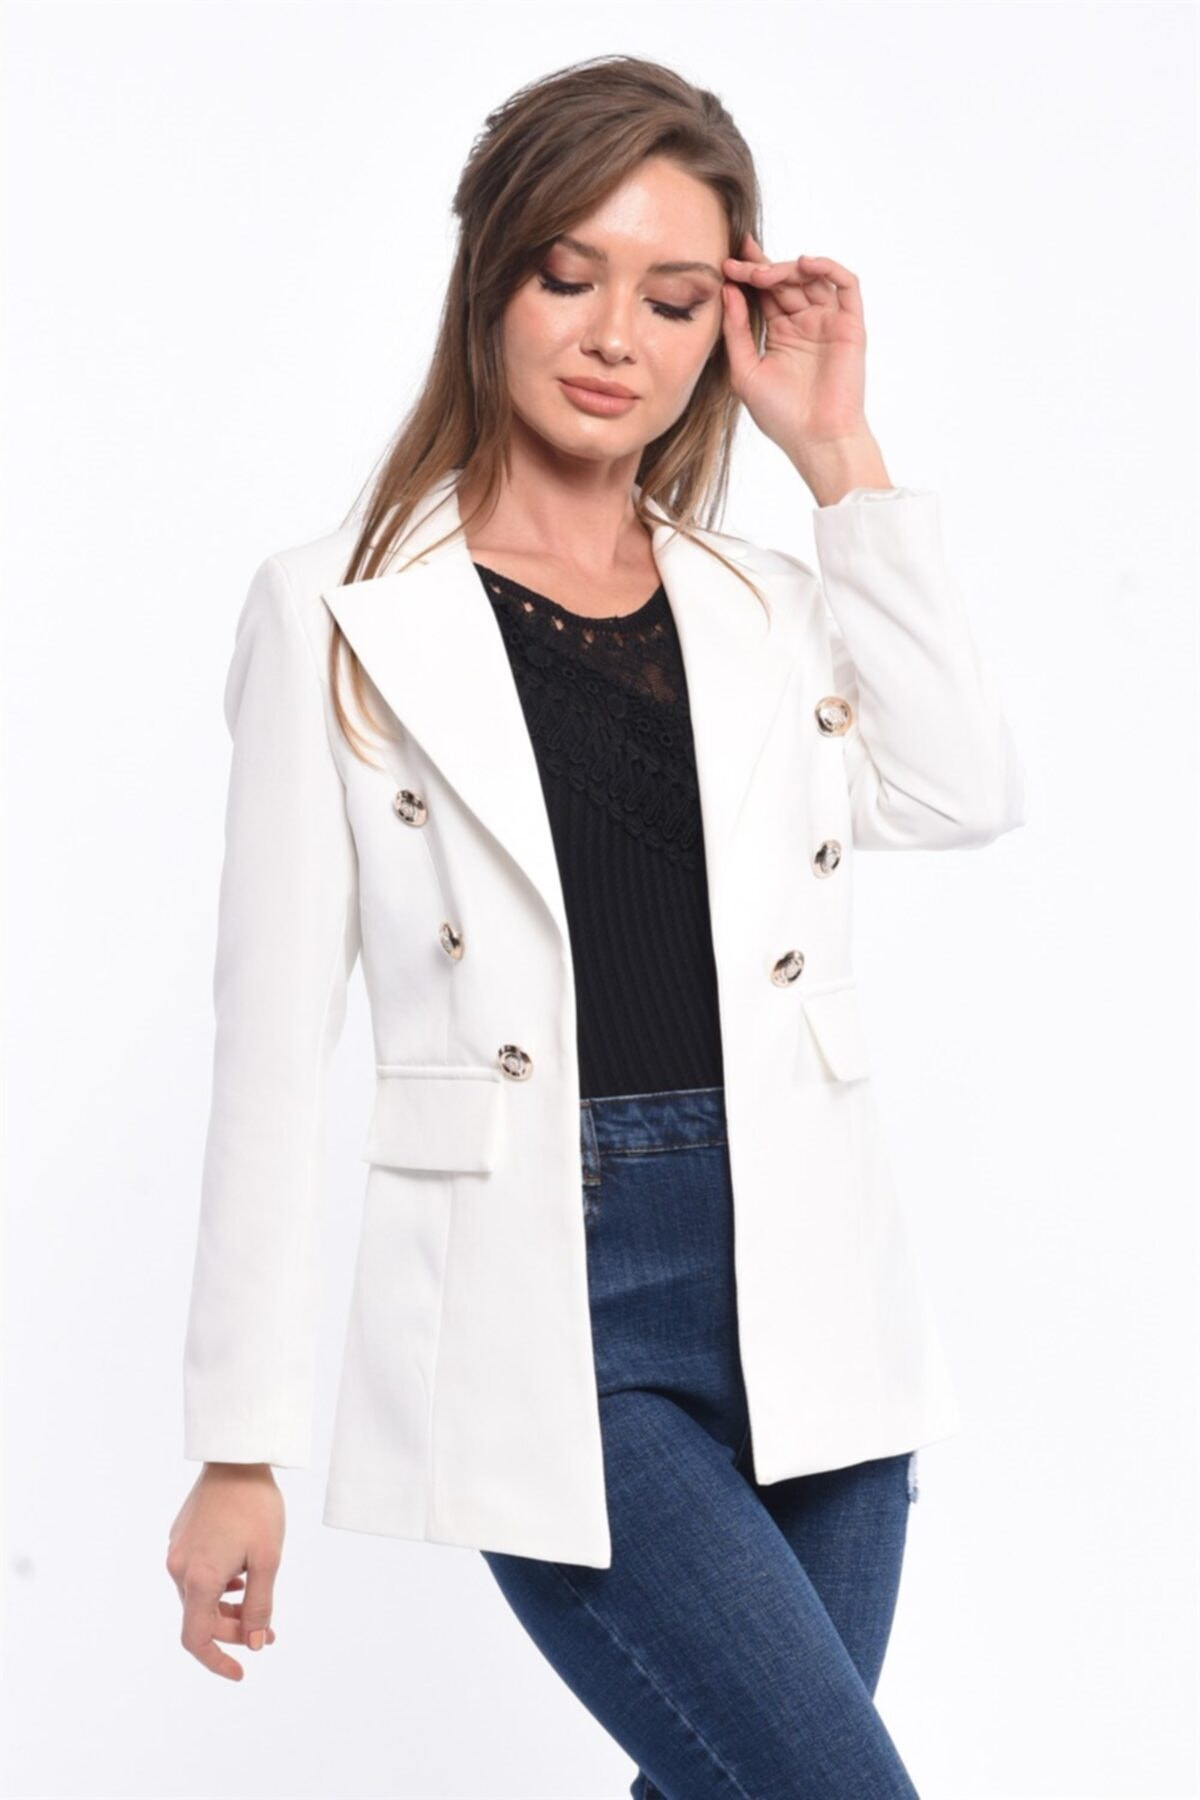 For Angels Beyaz Blazer Ceket 201830136 1